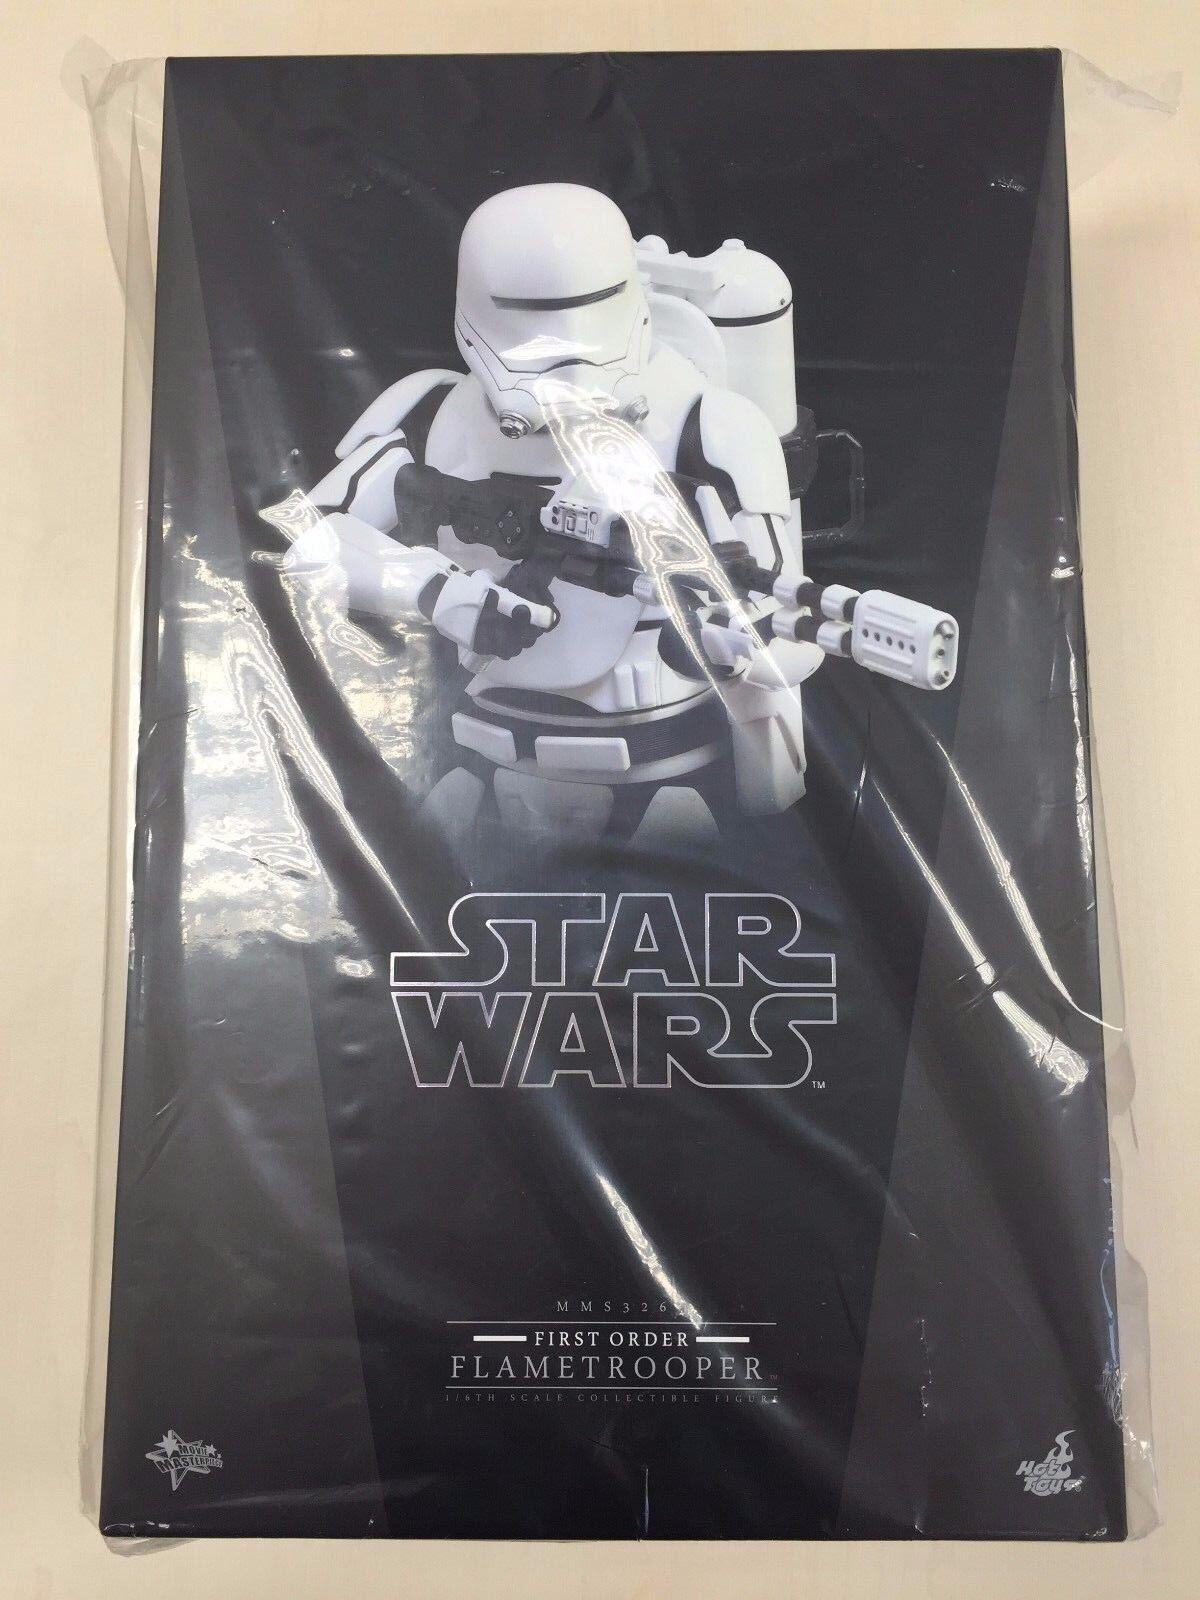 Hot Toys MMS 326 Star Wars Force Réveille de premier ordre flametrooper FIGURE NEW